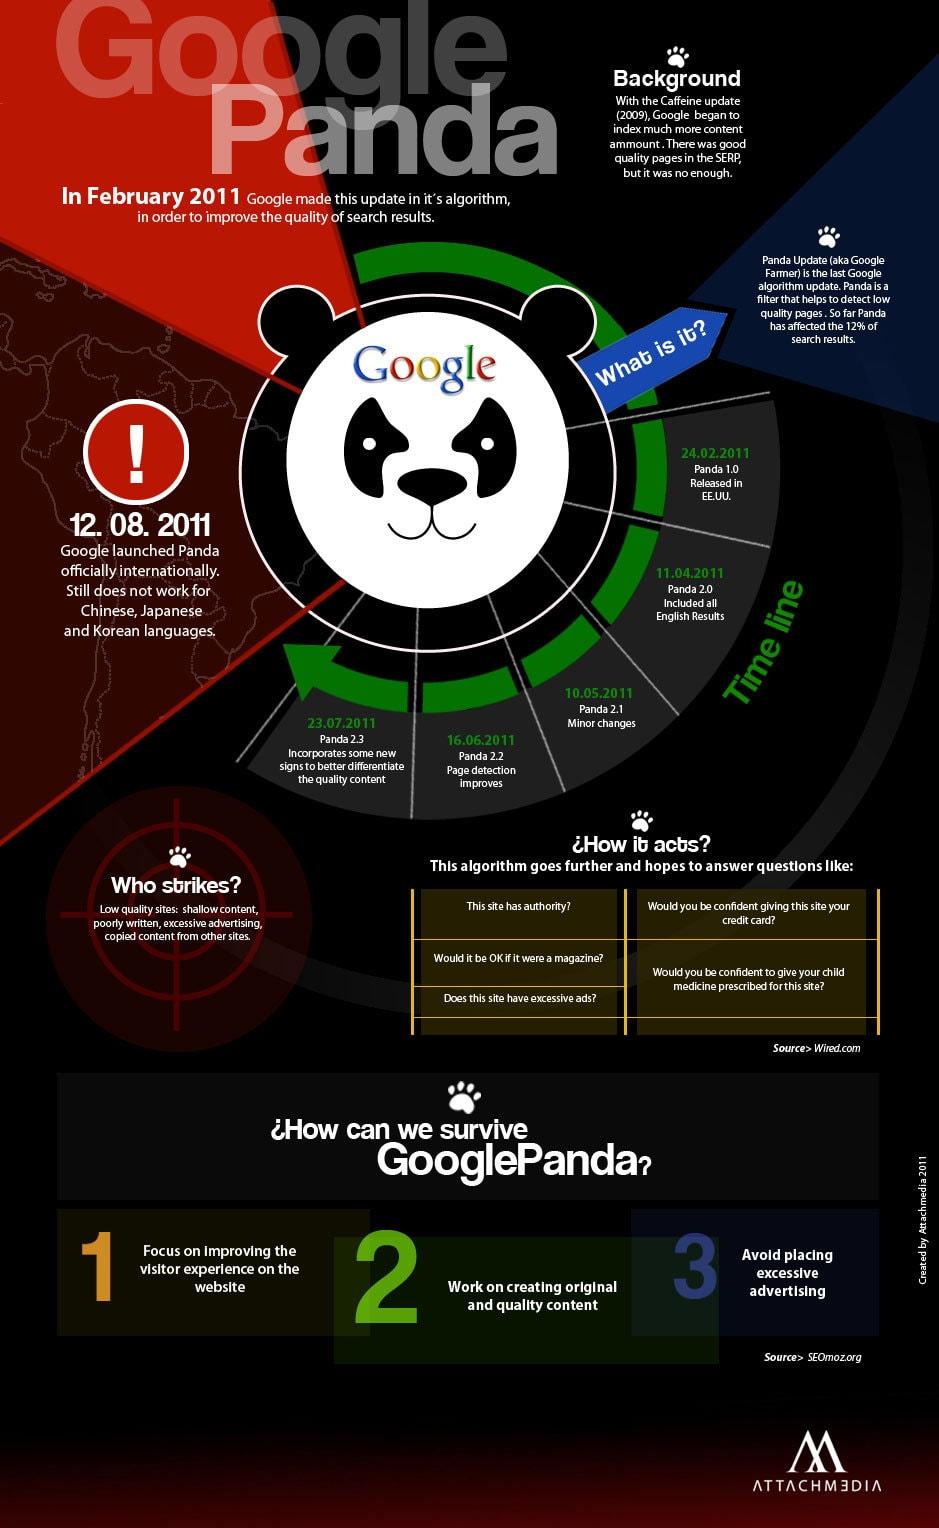 Google-Panda-Infographic